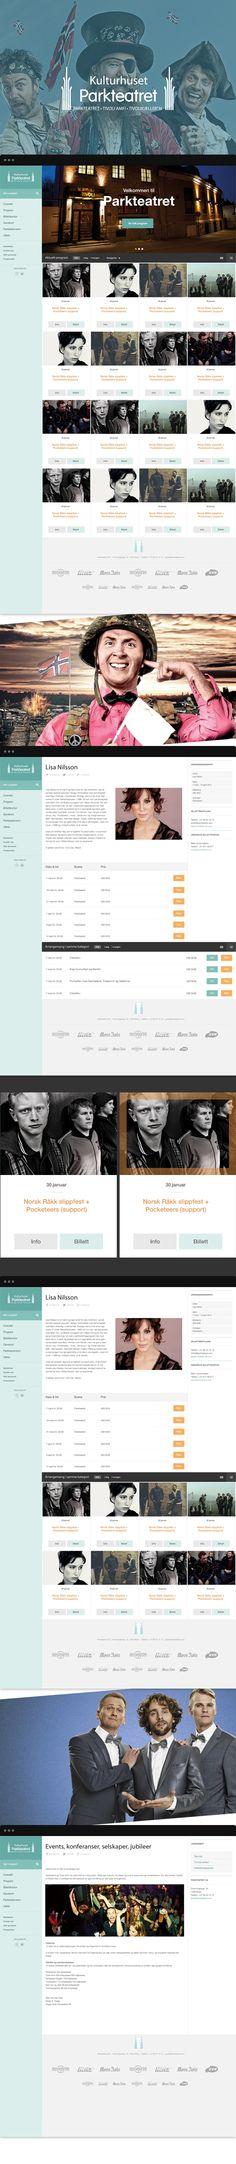 Parkteatret - website on Behance